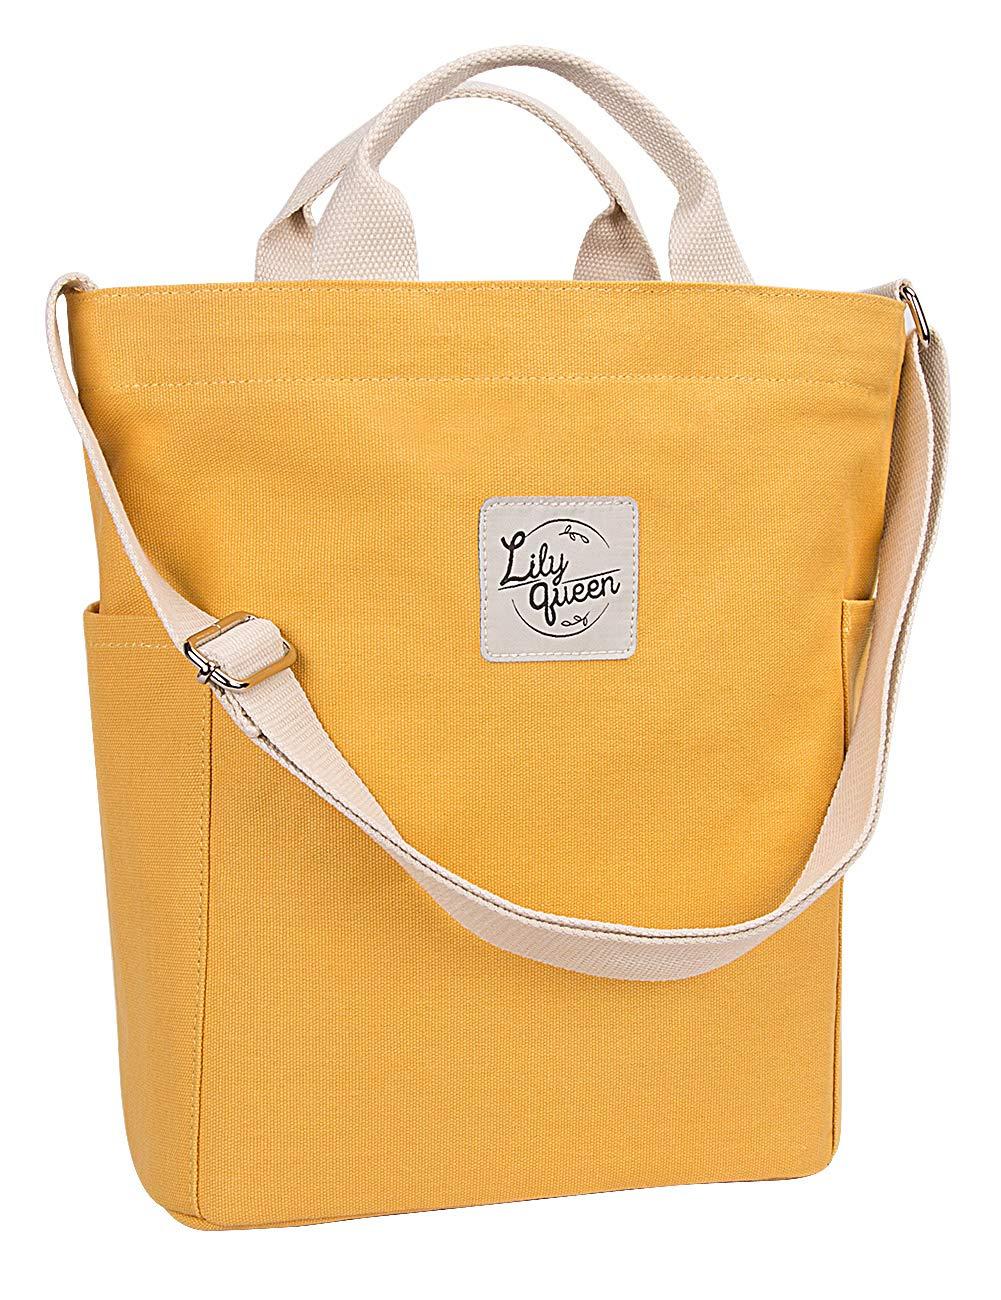 Lily Queen Women Canvas Tote Handbags Casual Hobo Shoulder Bag Crossbody Jin Shi Clothing LQ-FBP